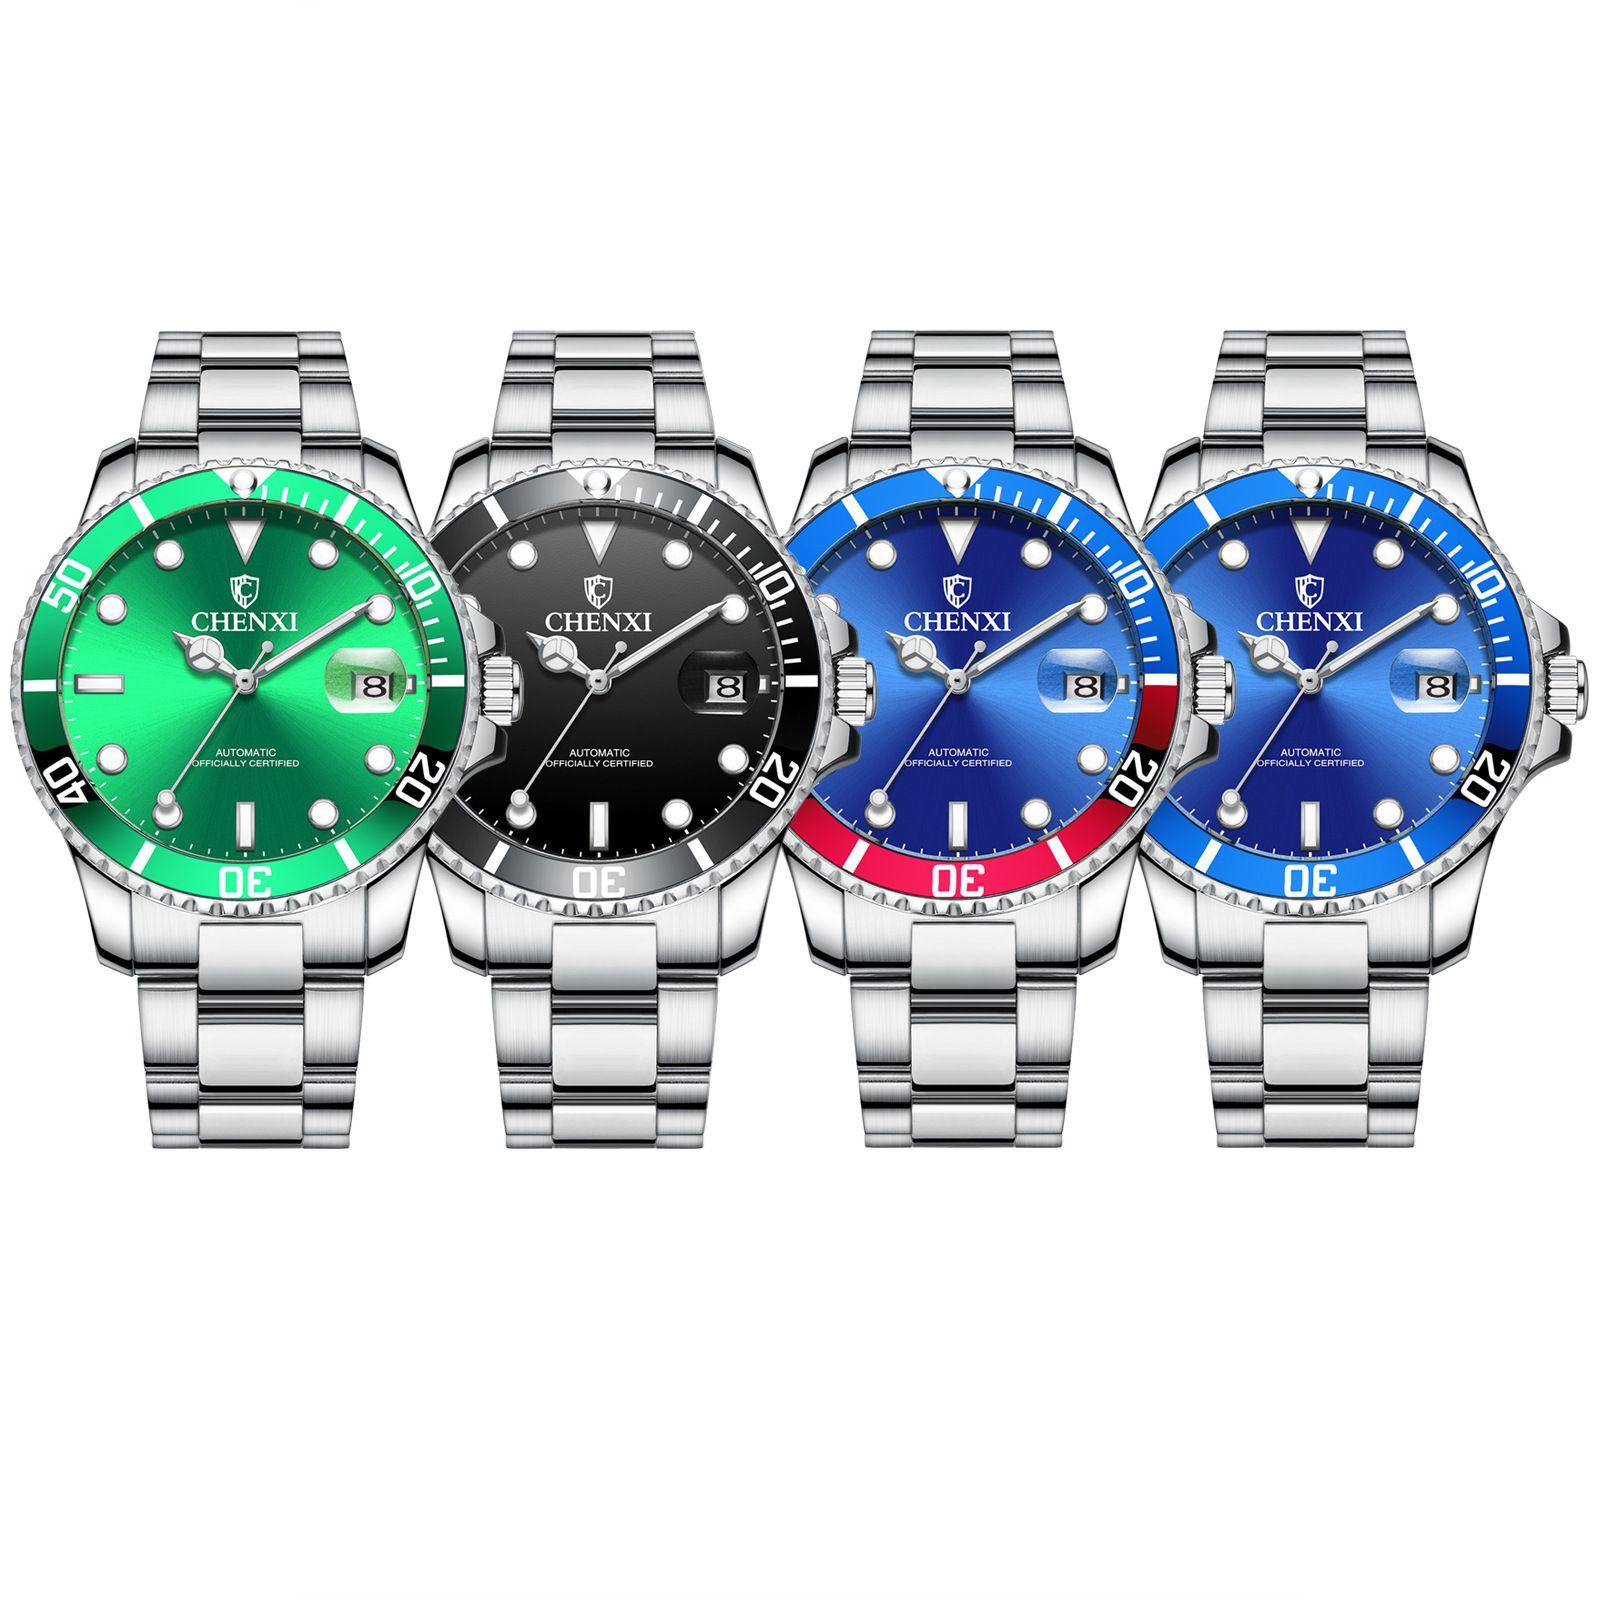 Green Water Ghost-mechanische Armbanduhr Dämmerung Markemens-Geschäfts-Uhr-8805a Spot-Großhandel automatische analoge Uhr